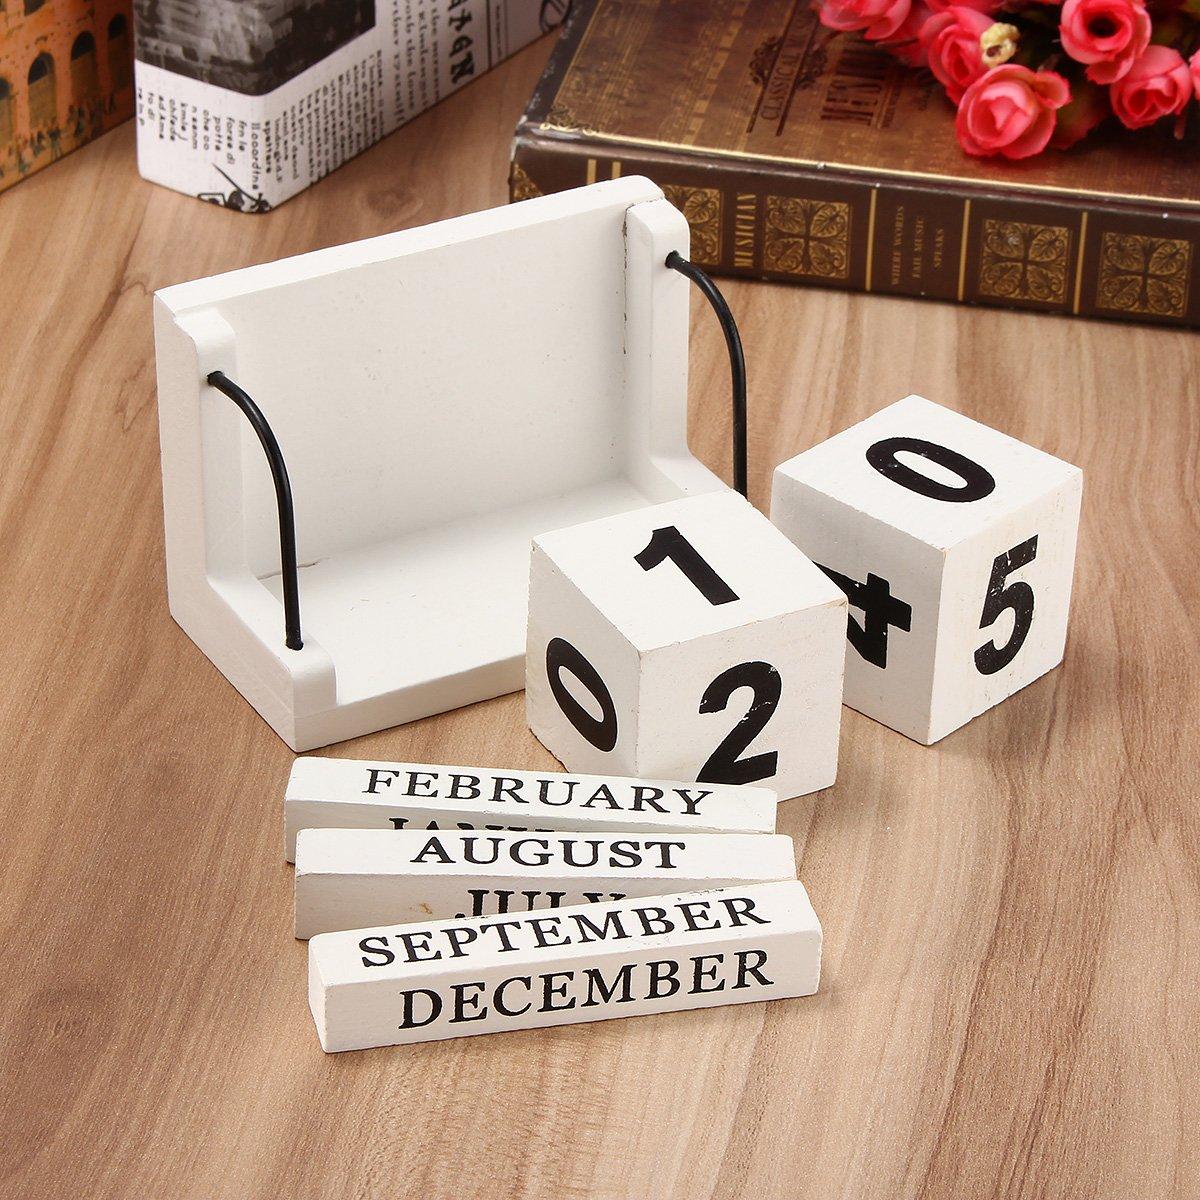 Jeteven Holz Kalender aus Würfel Dauerkalender Tischkalender Handwerk Desktop Dekoration Home Deko Haus (B)